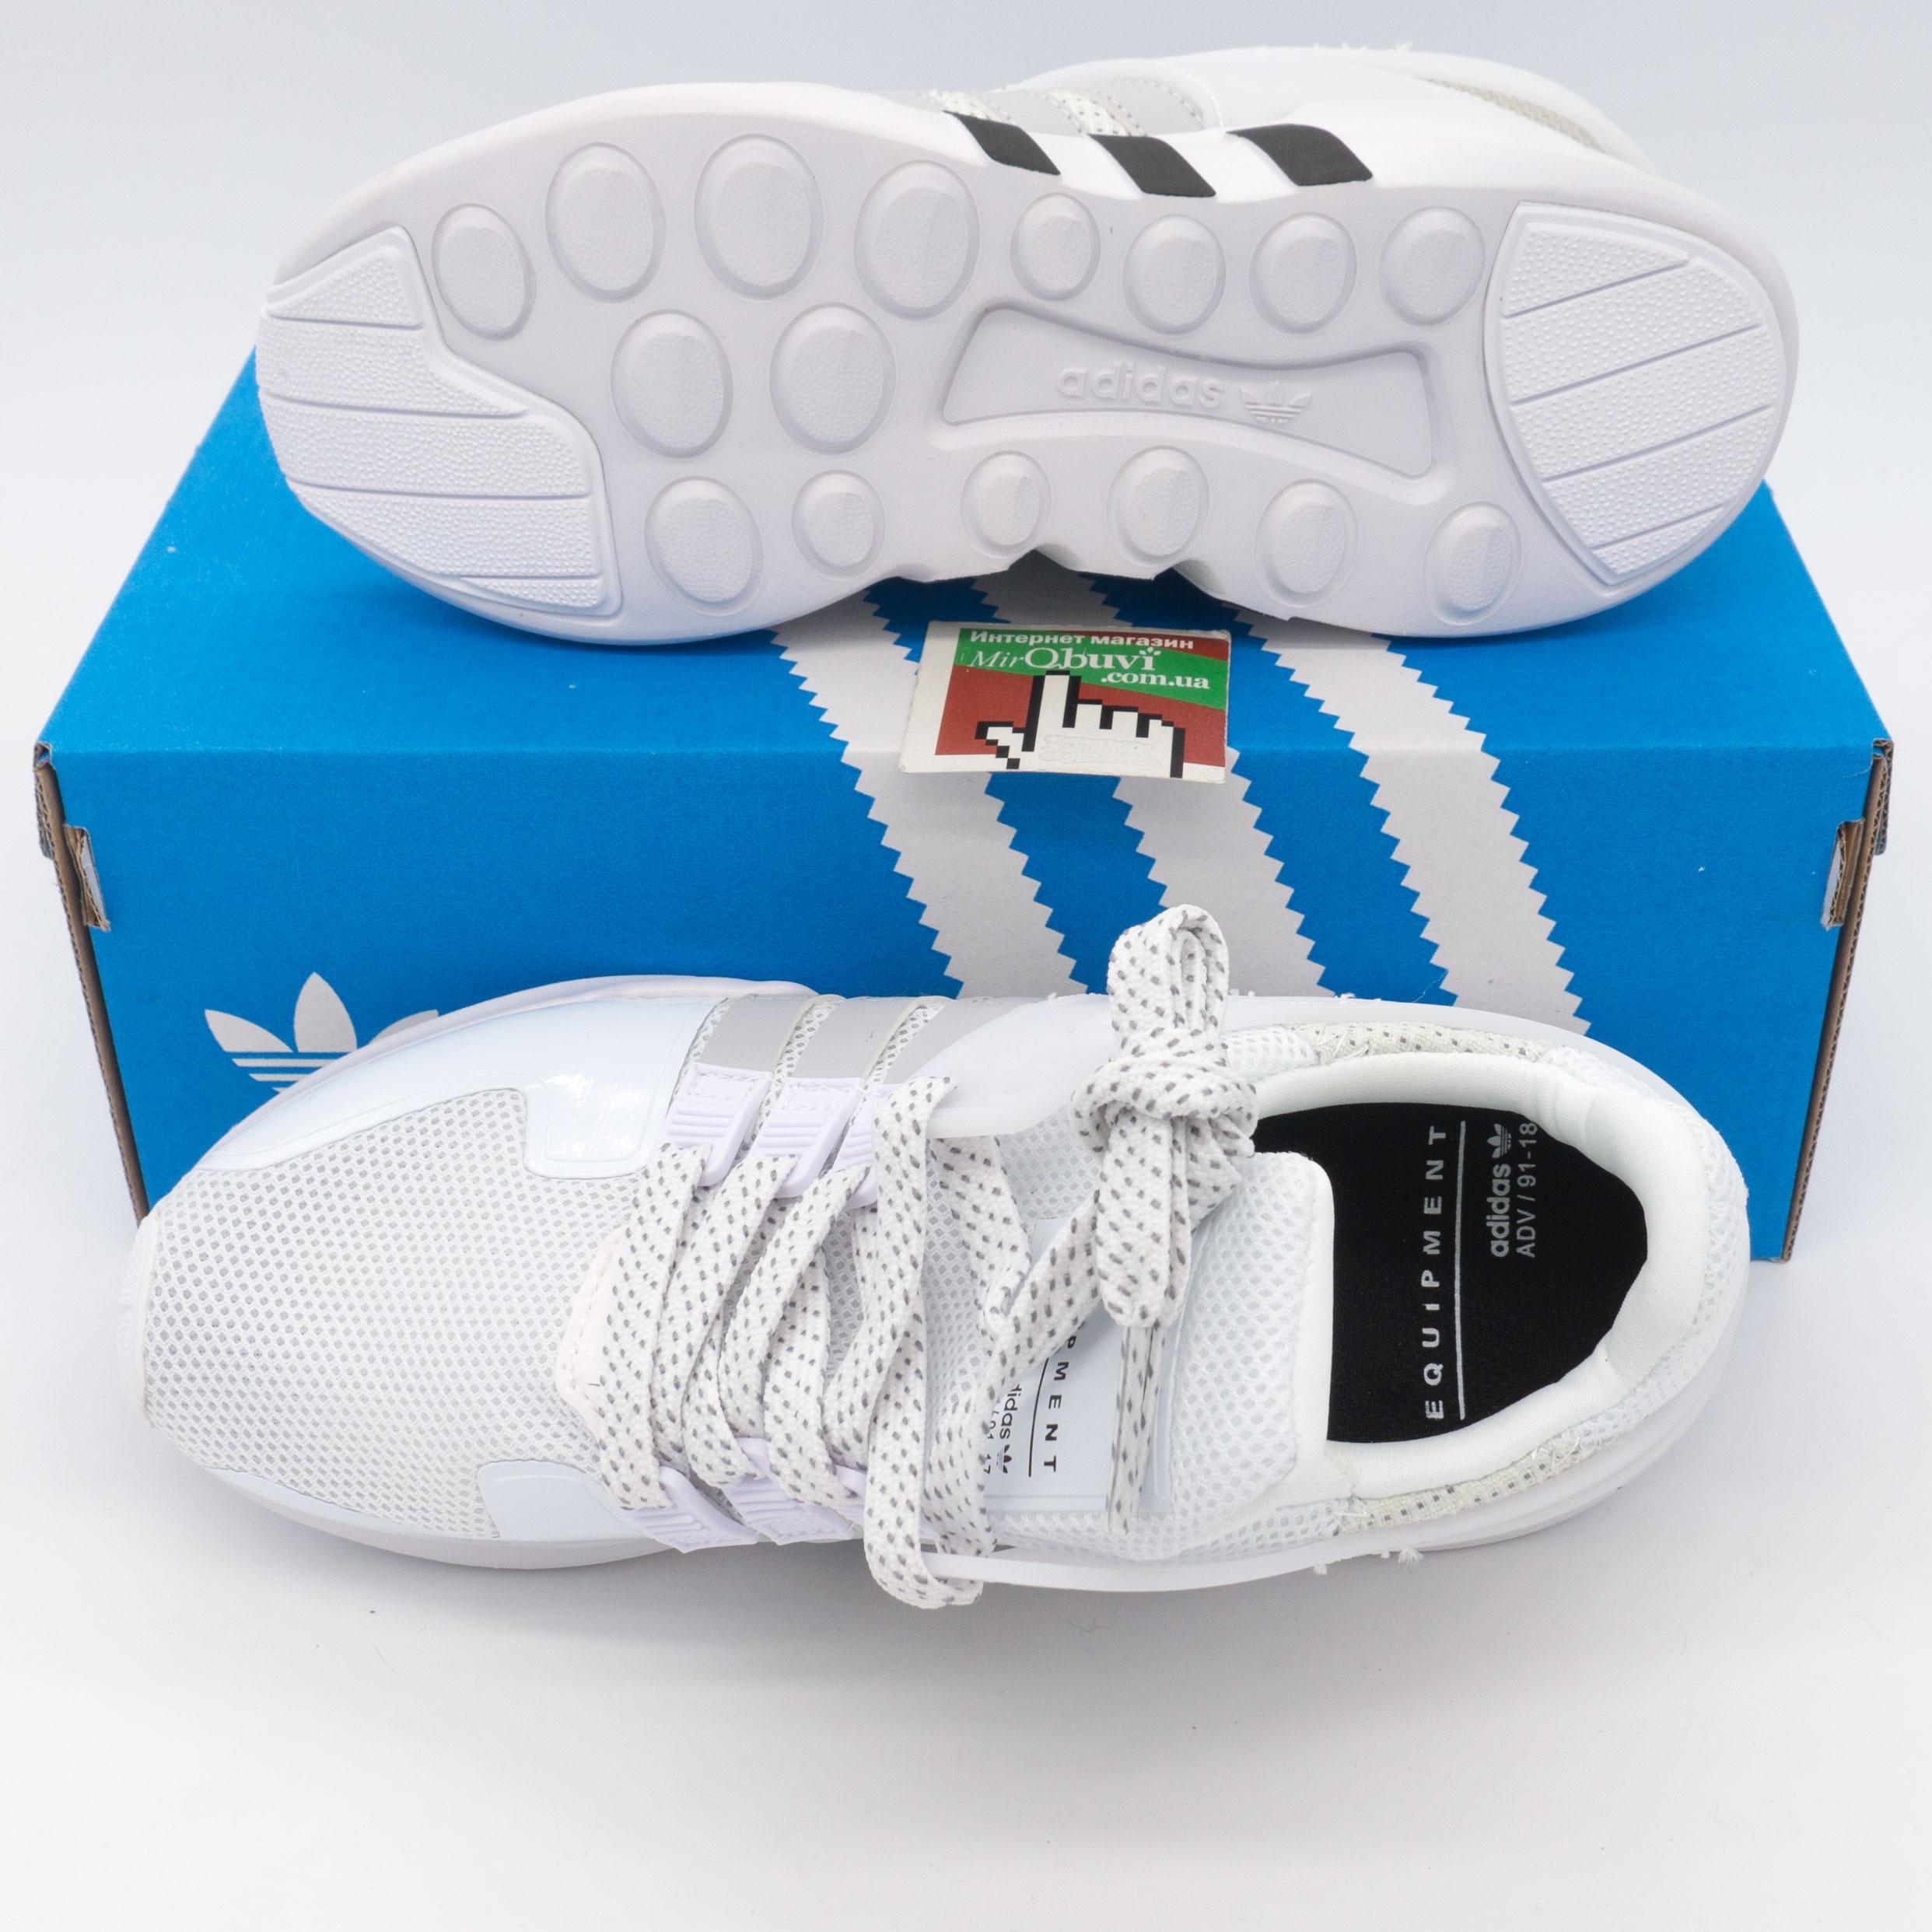 фото bottom Кроссовки Adidas Equipment Support (EQT) белые с серым. Топ качество! bottom